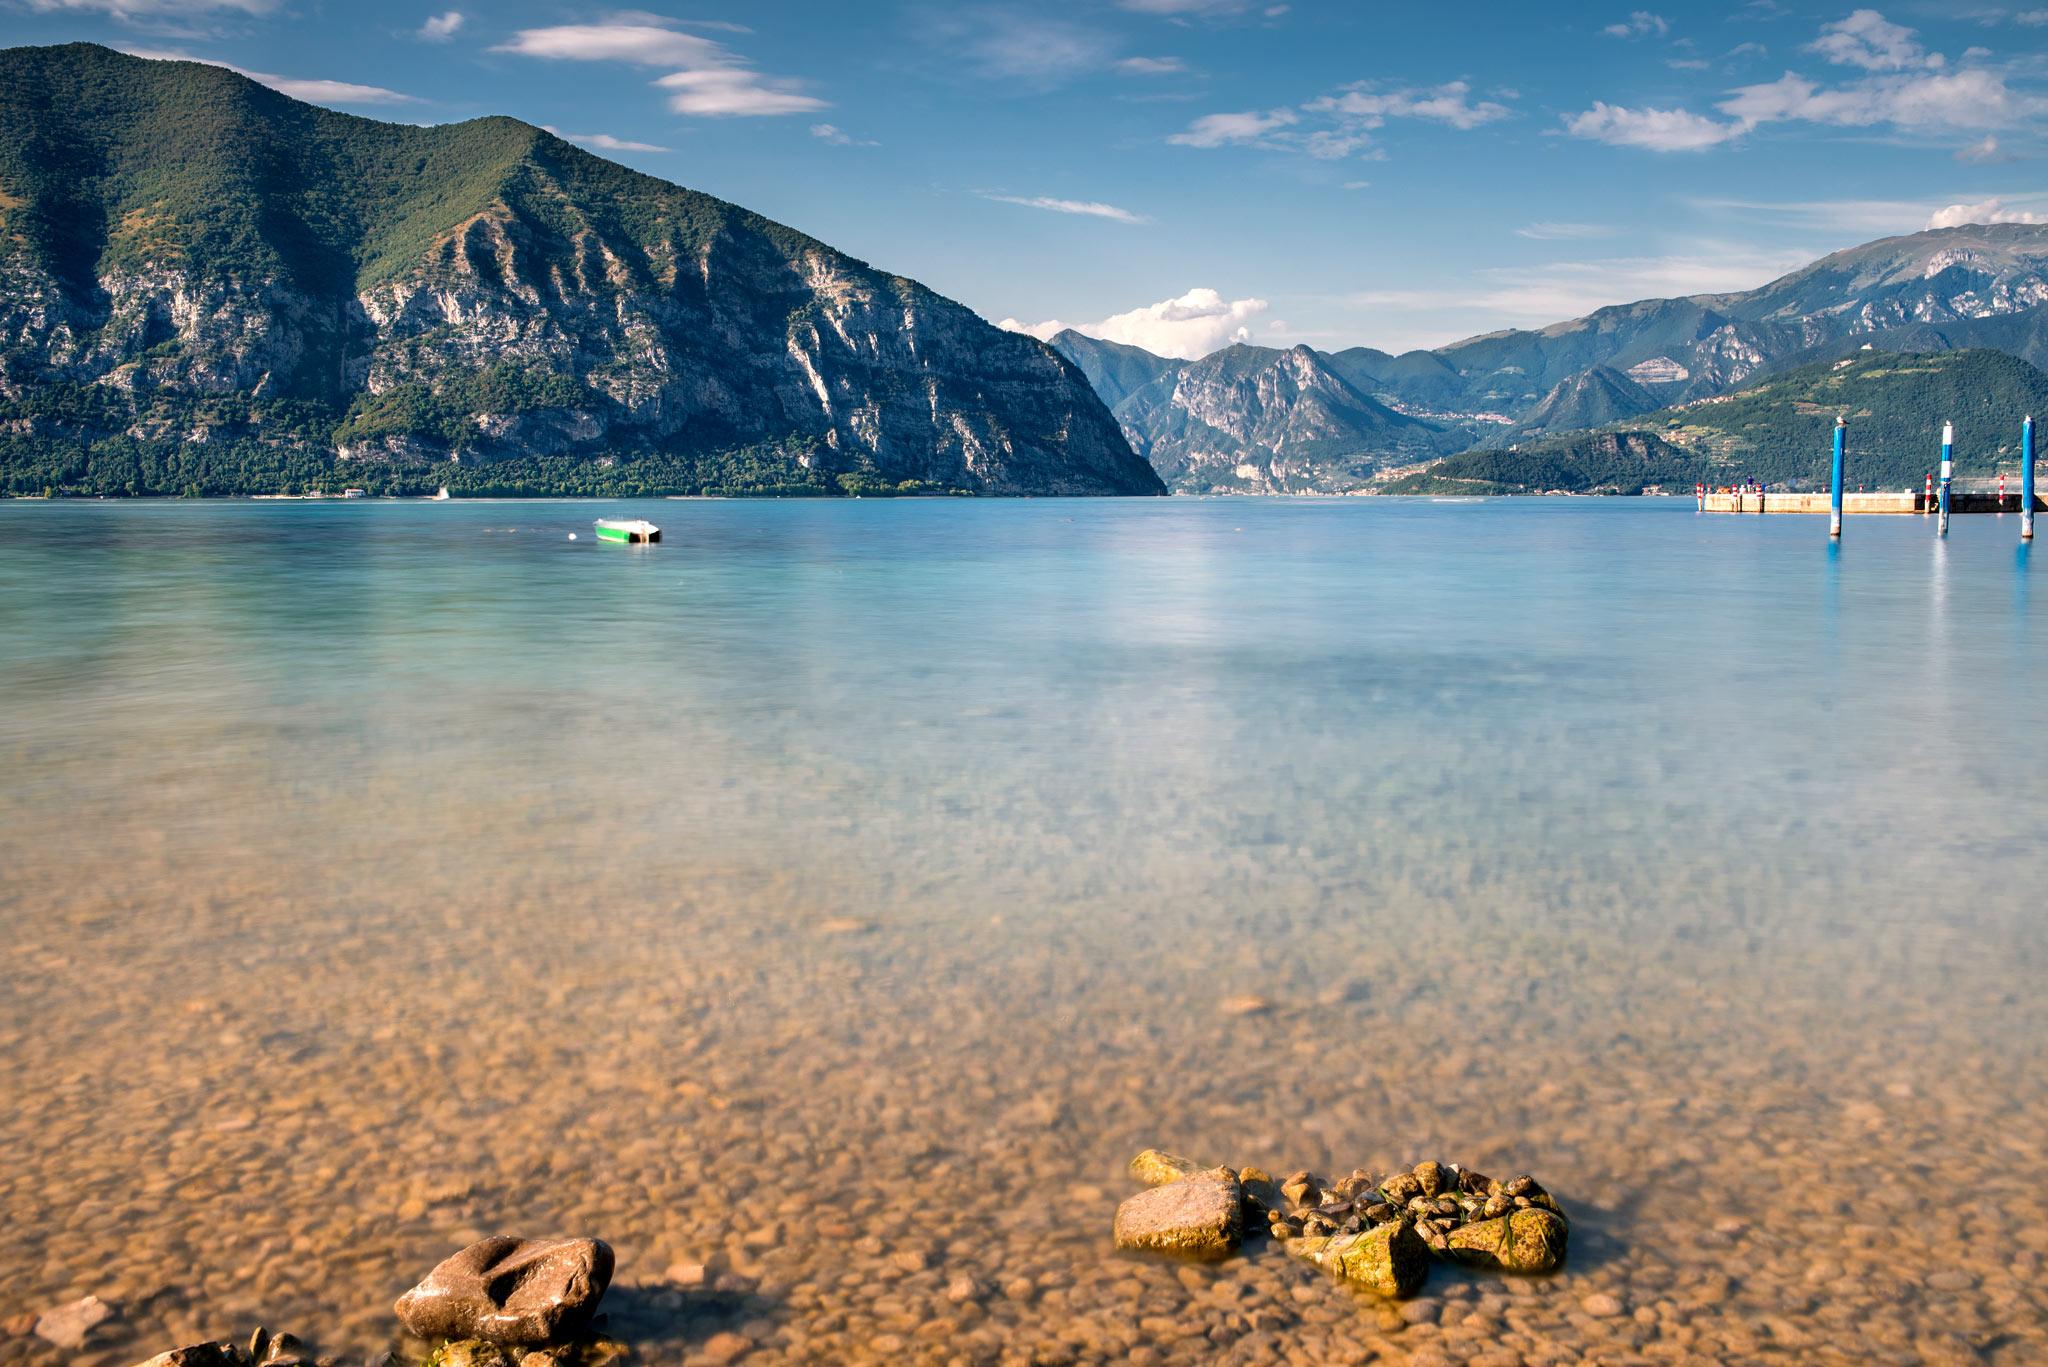 Paesaggi-Italia - Emanuele Tibaldi Fotografo Lago.dIseo  - Fotografo di paesaggi-Lago.dIseo - Fotografo di paesaggi-Lago.dIseo